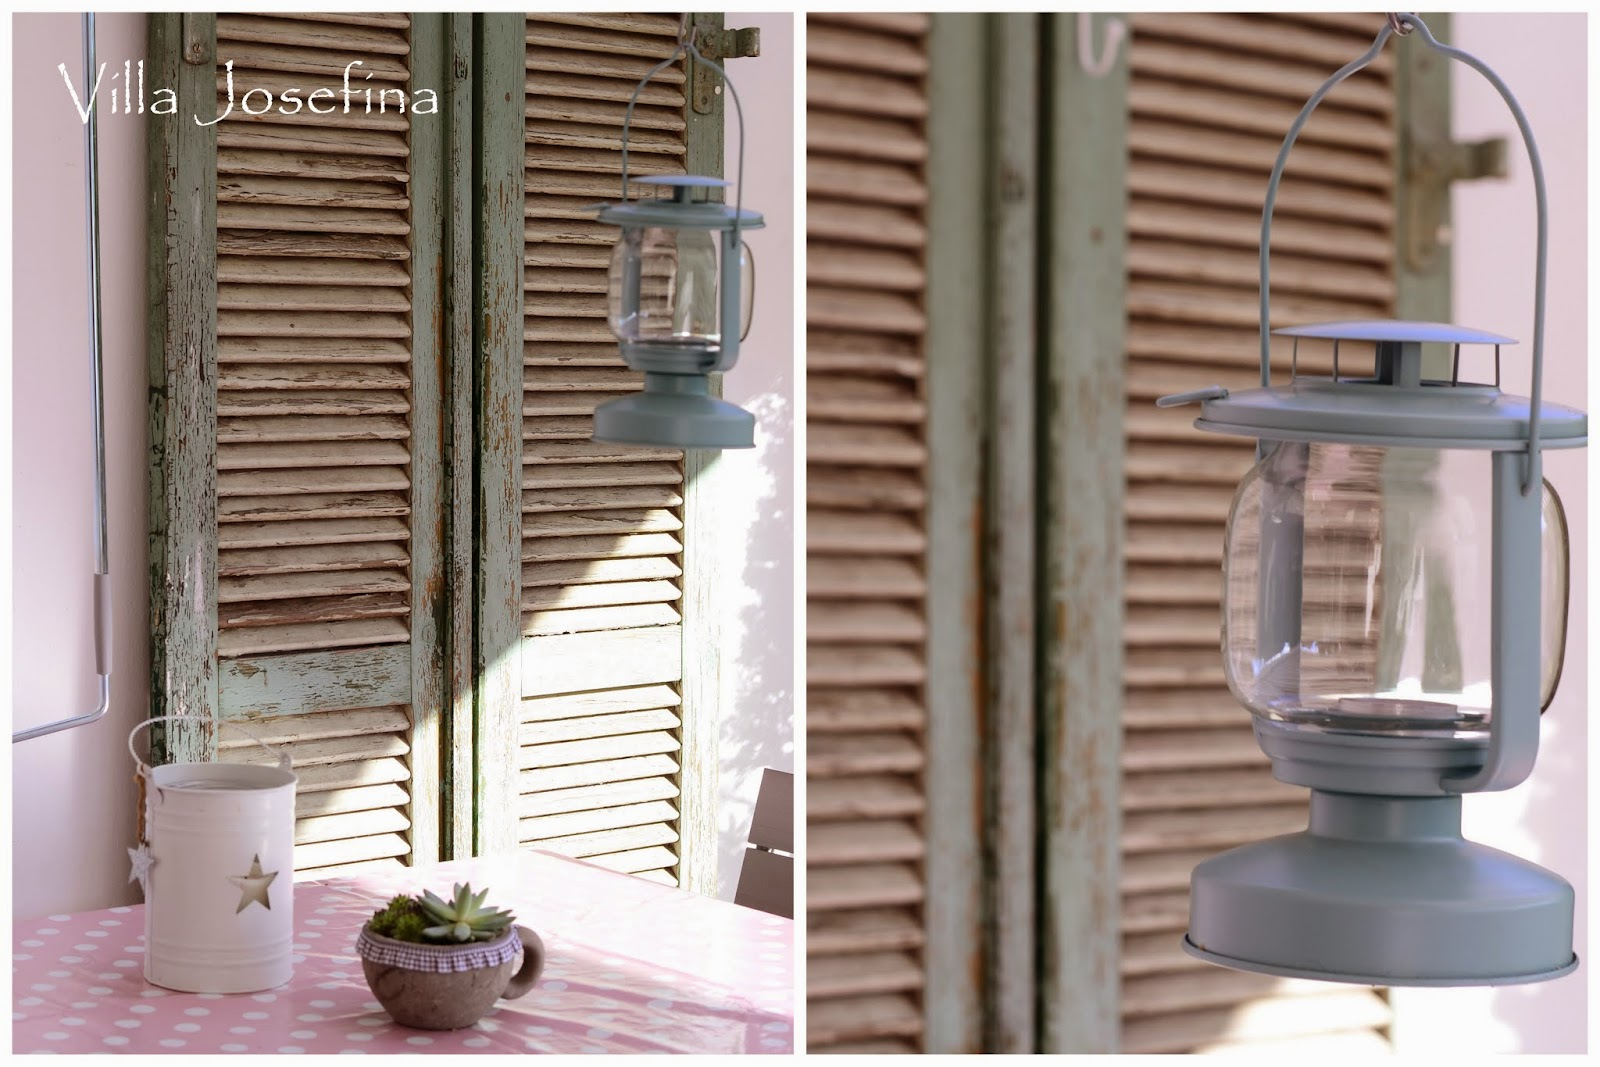 alte fensterl den neuer platz villa josefina. Black Bedroom Furniture Sets. Home Design Ideas